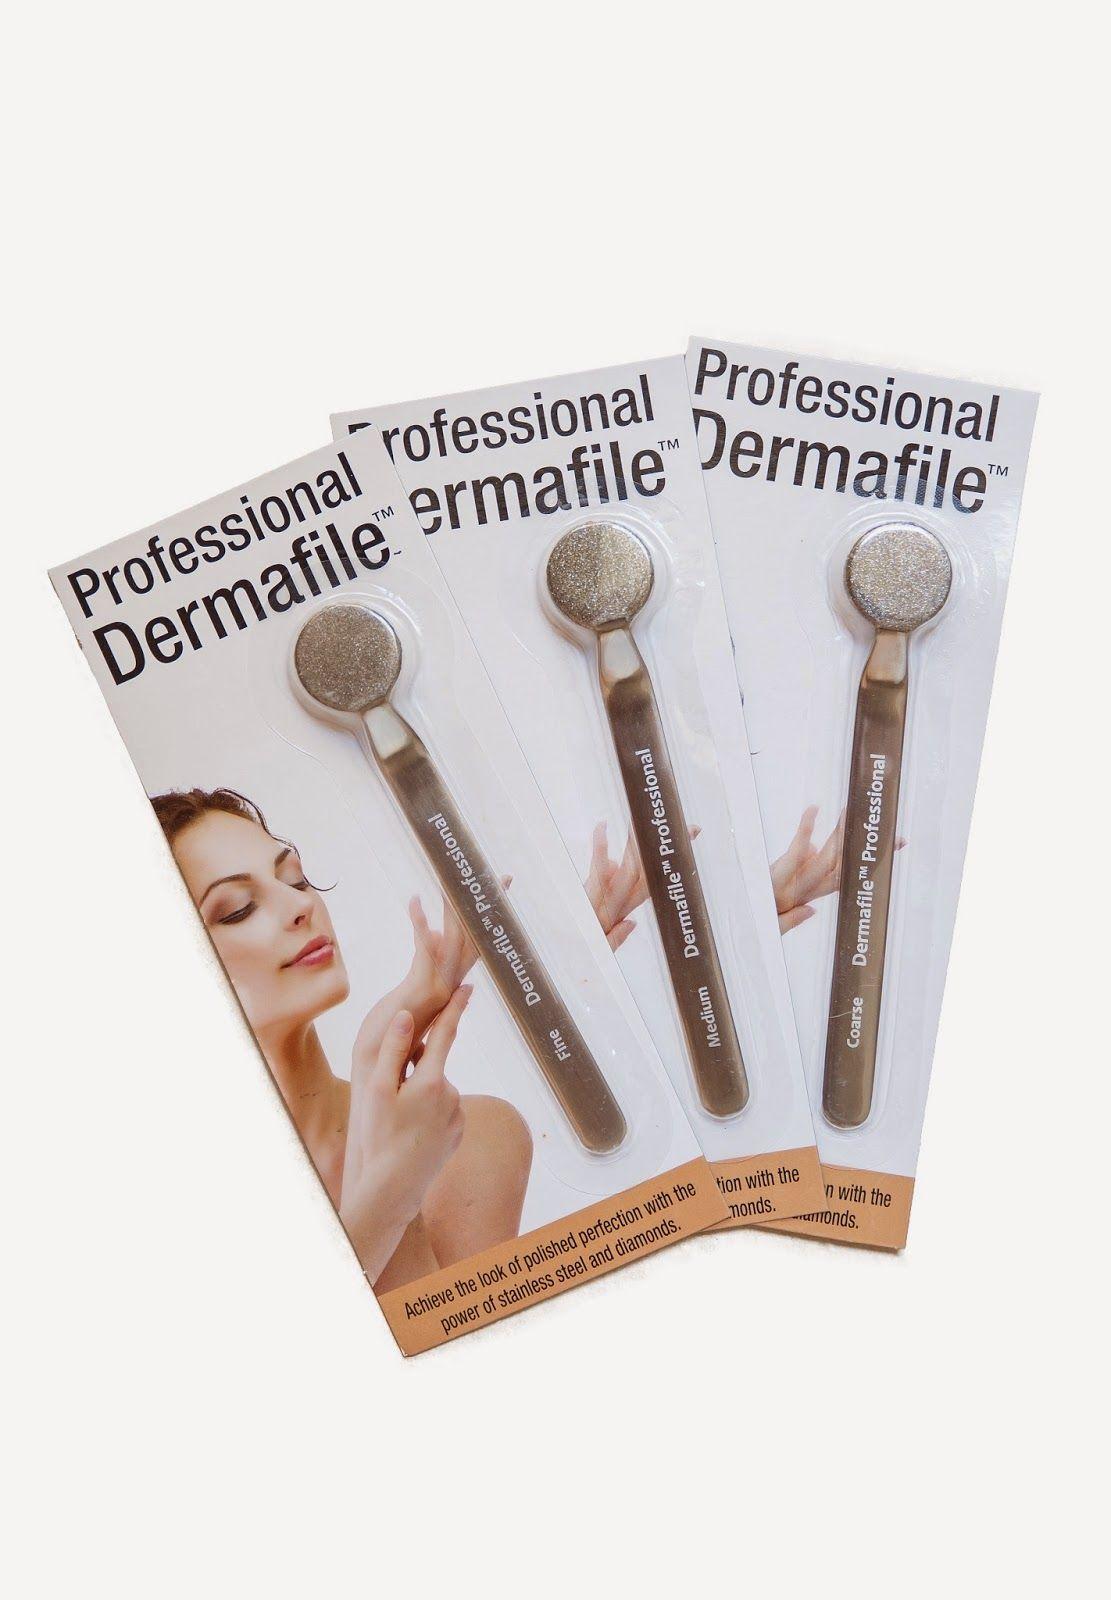 Learn about Dermafiles